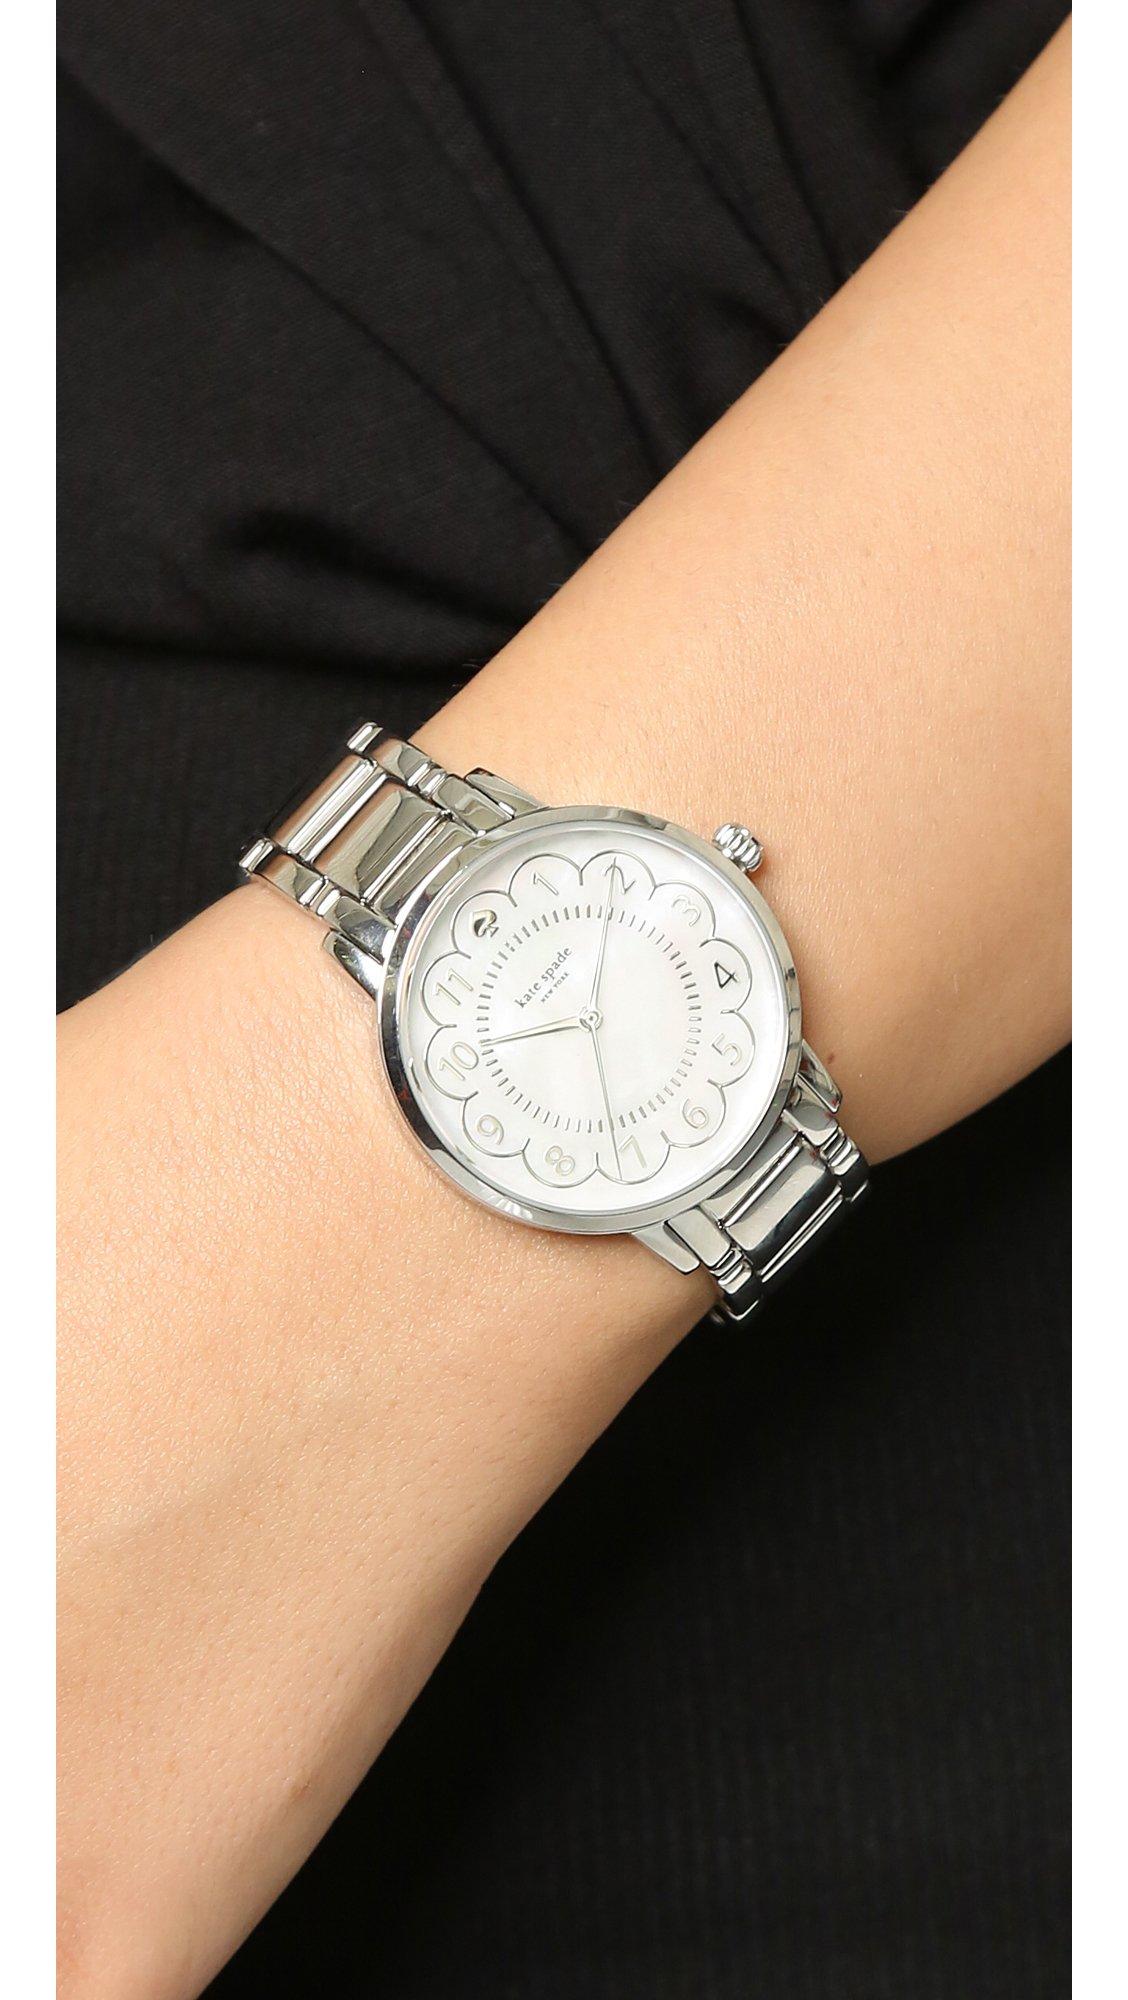 Gramercy Watch Silver